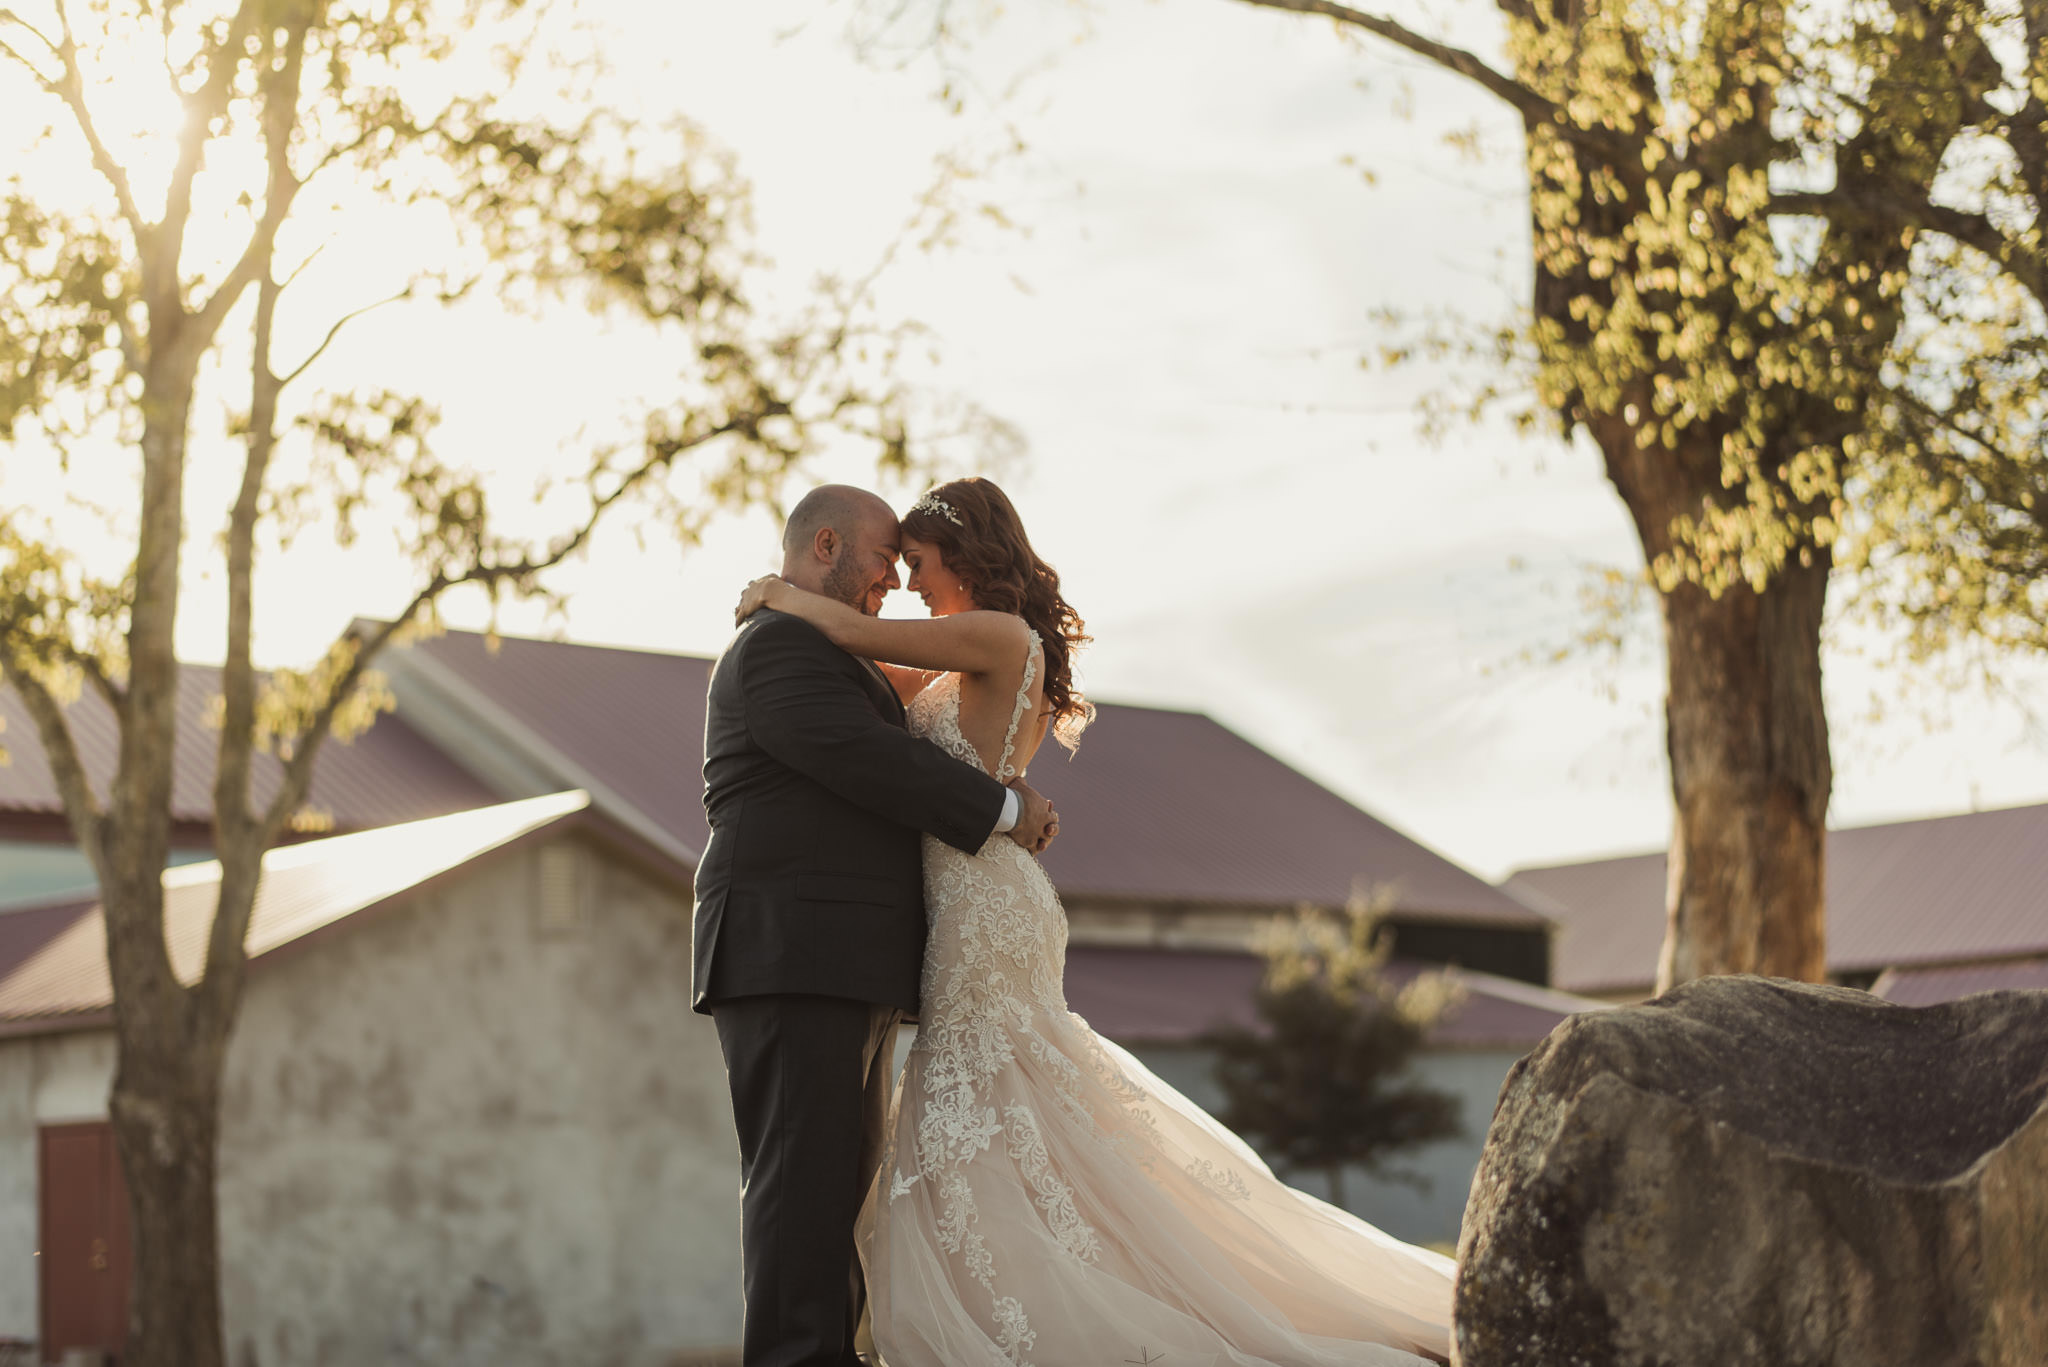 Cynthia-Curtis-Olde-Dobbine-Station-Houston-Wedding-Photographer-sm-47.jpg